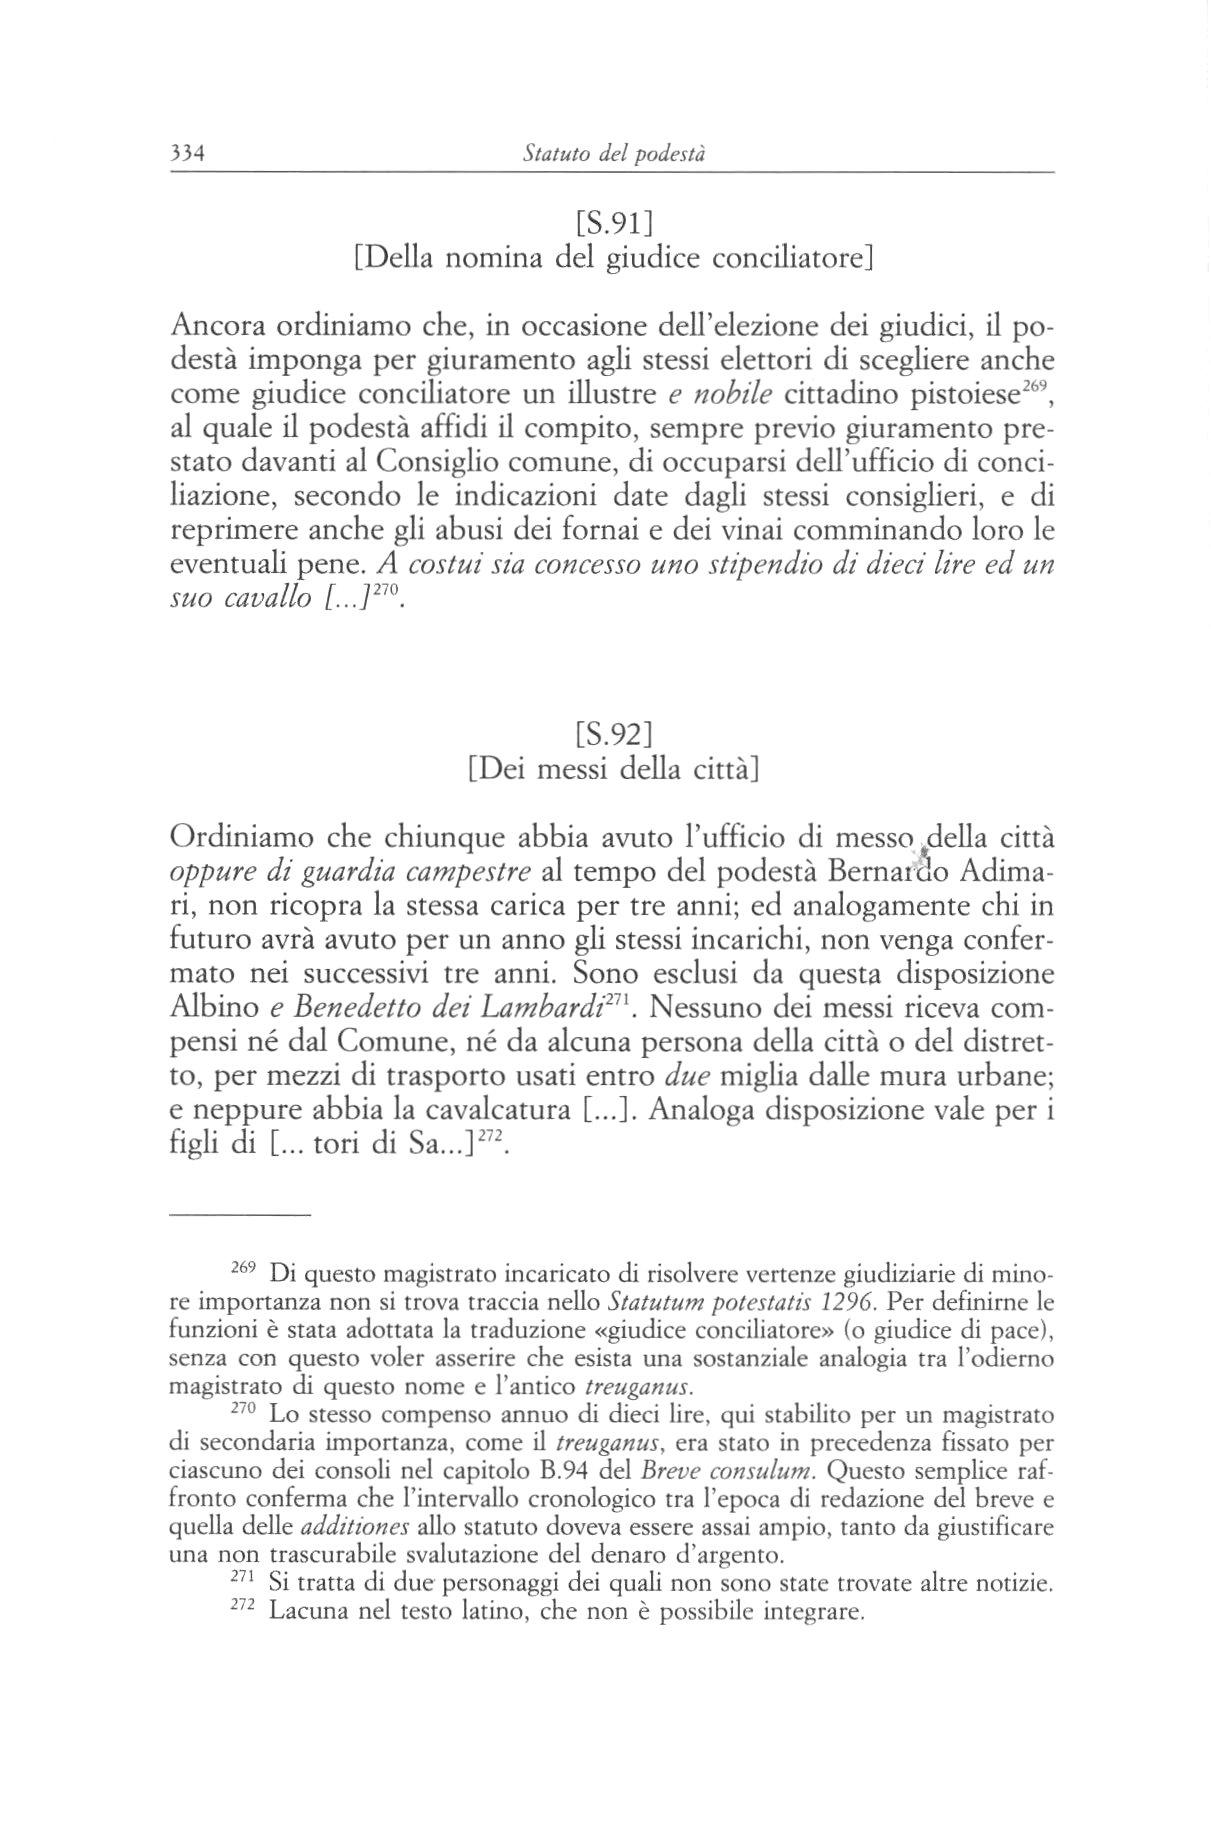 statuti pistoiesi del sec.XII 0334.jpg